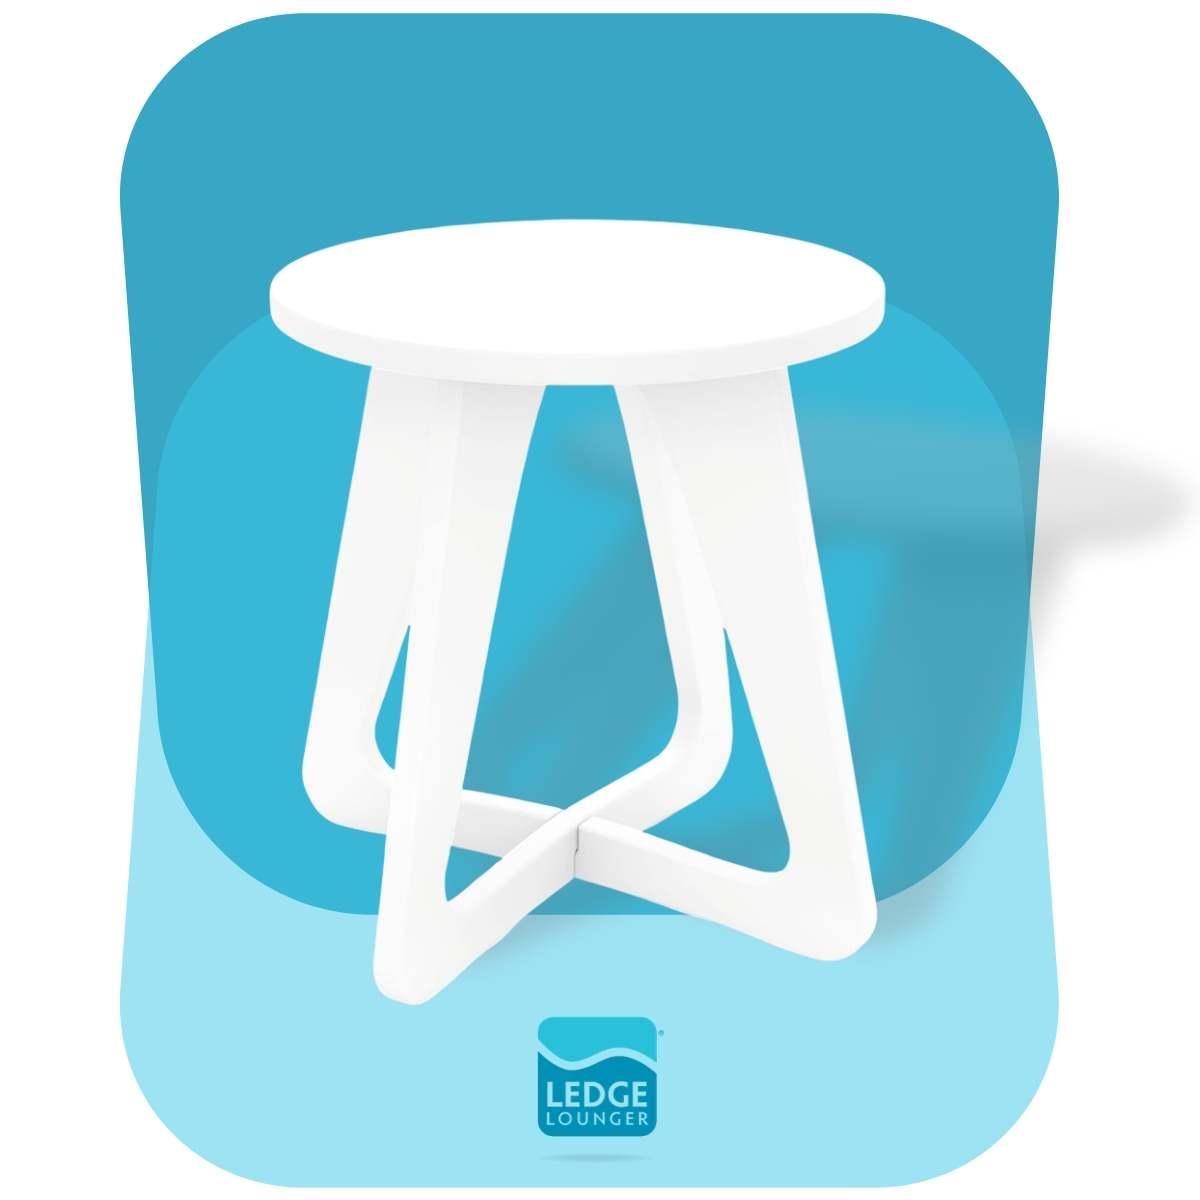 ledge-lounger-mainstay-stool white